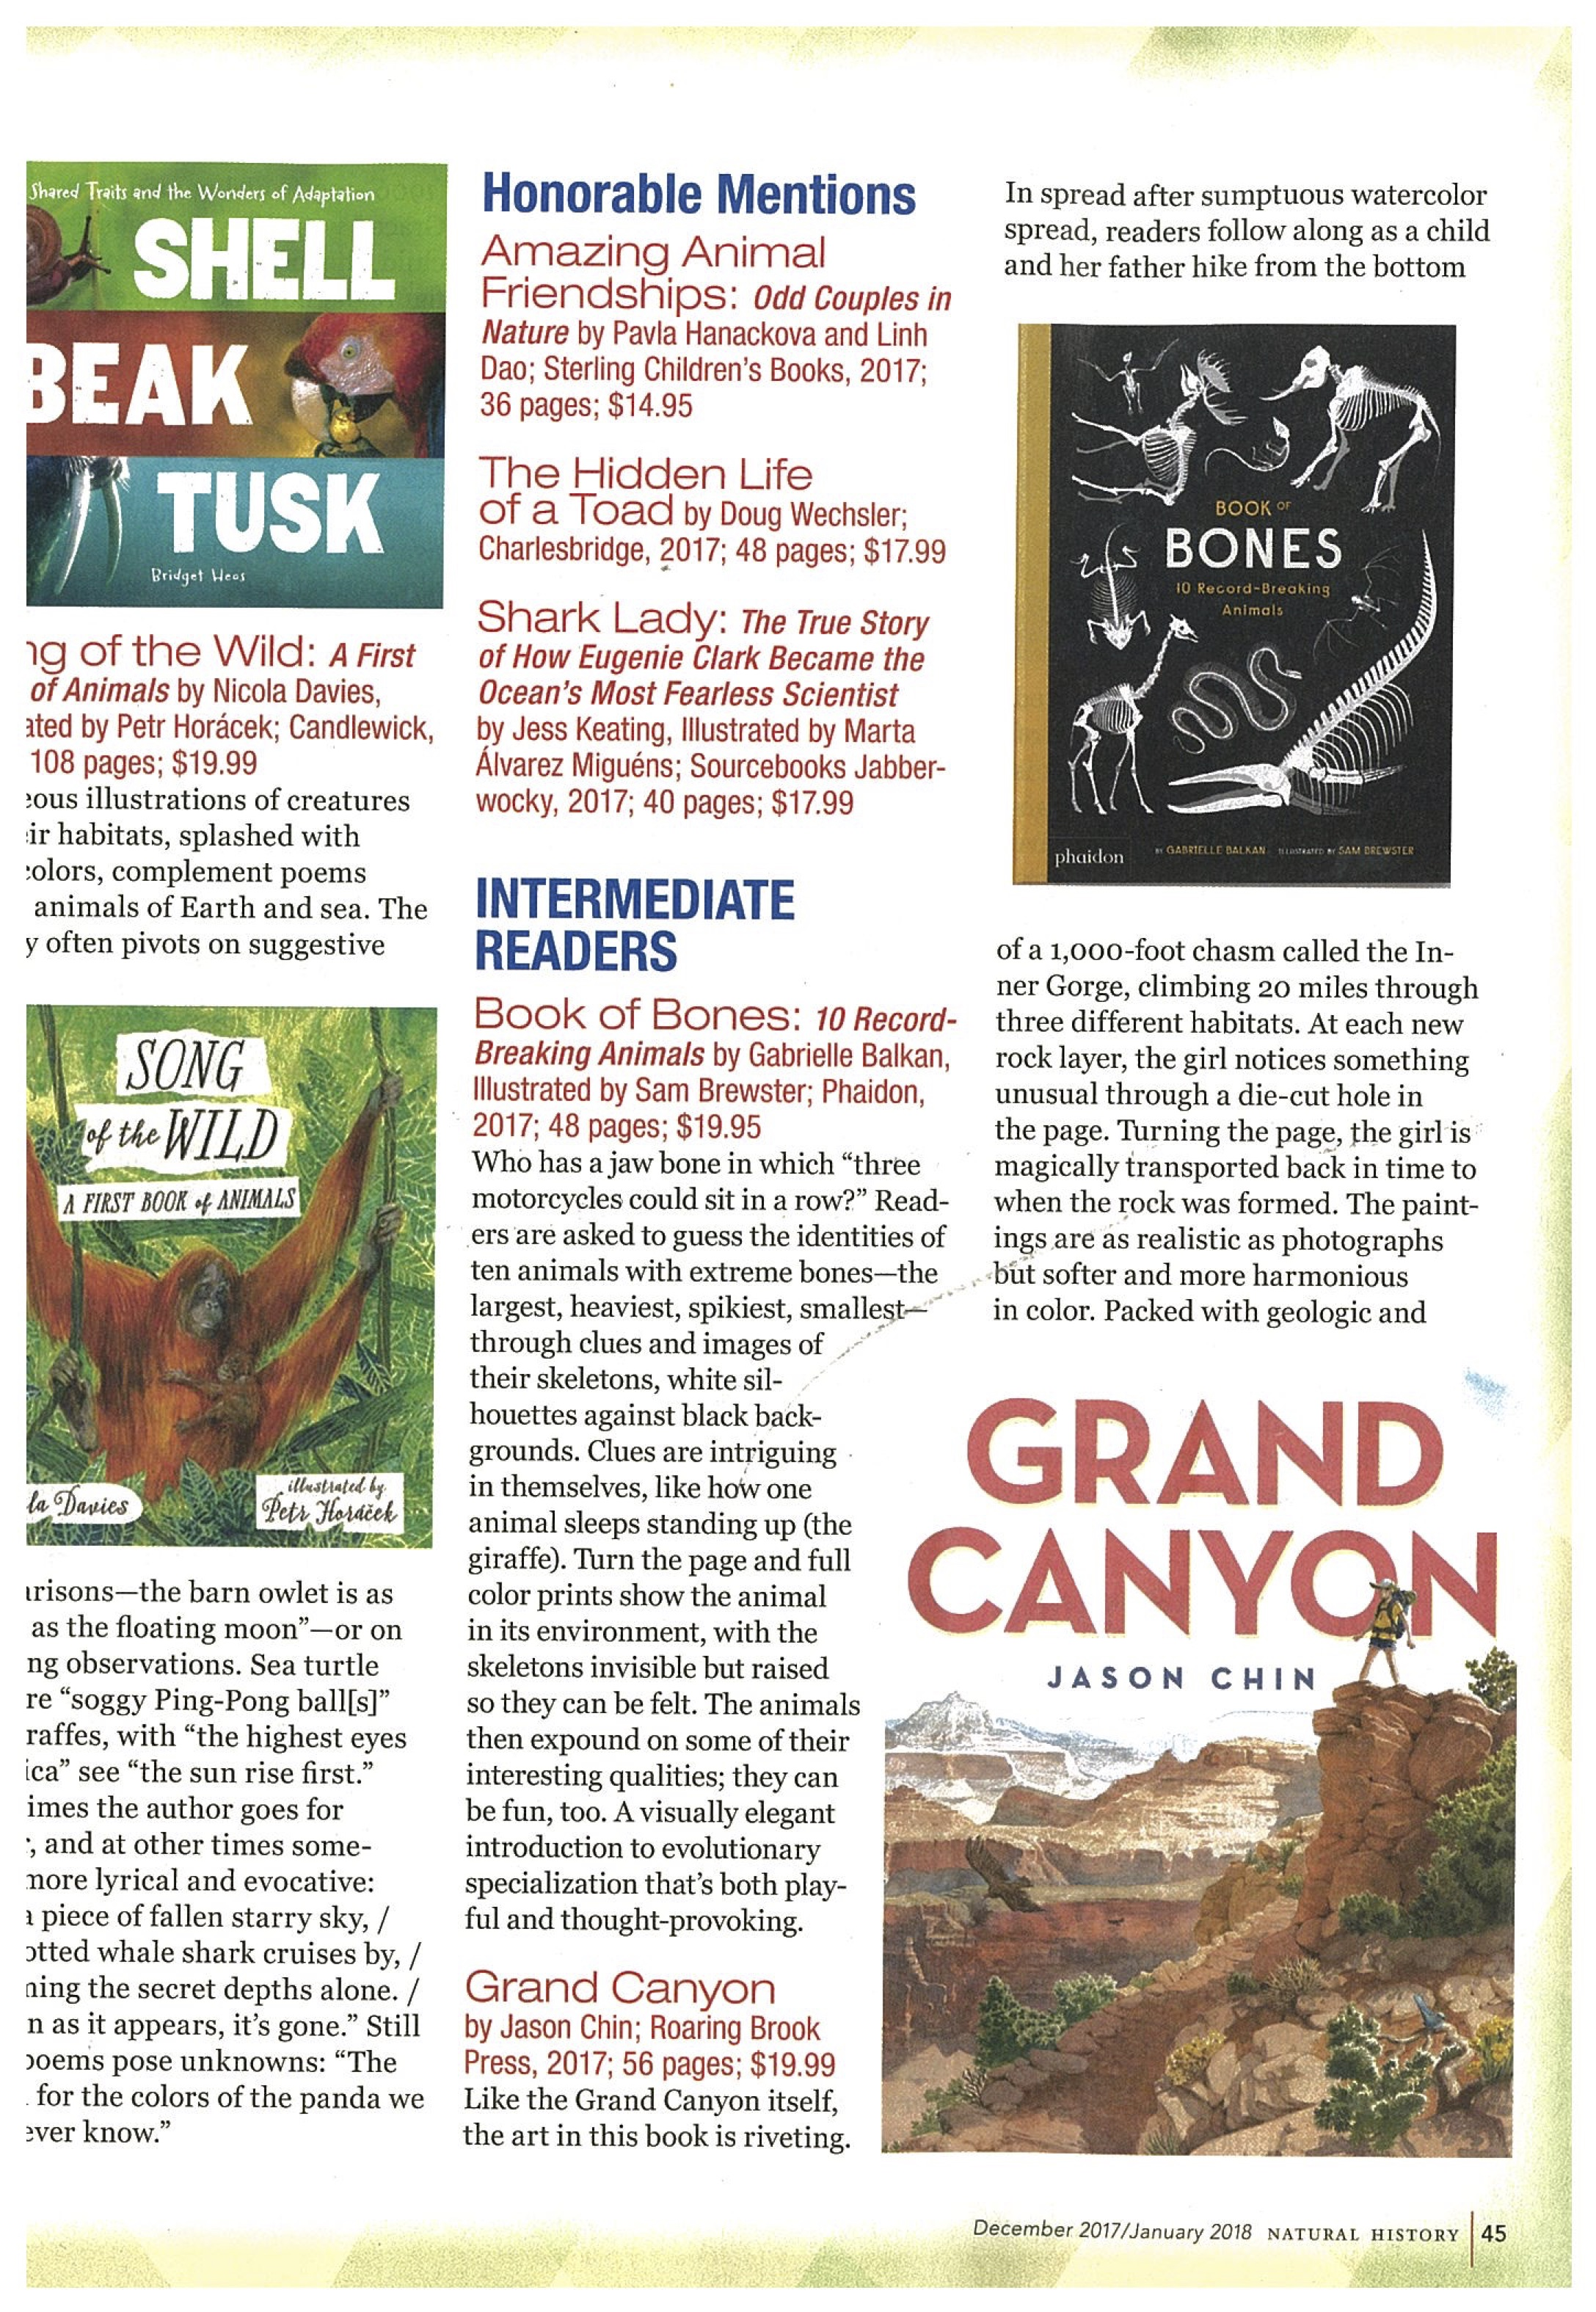 Natural History Magazine_Book of Bones_Dec 2017.jpg